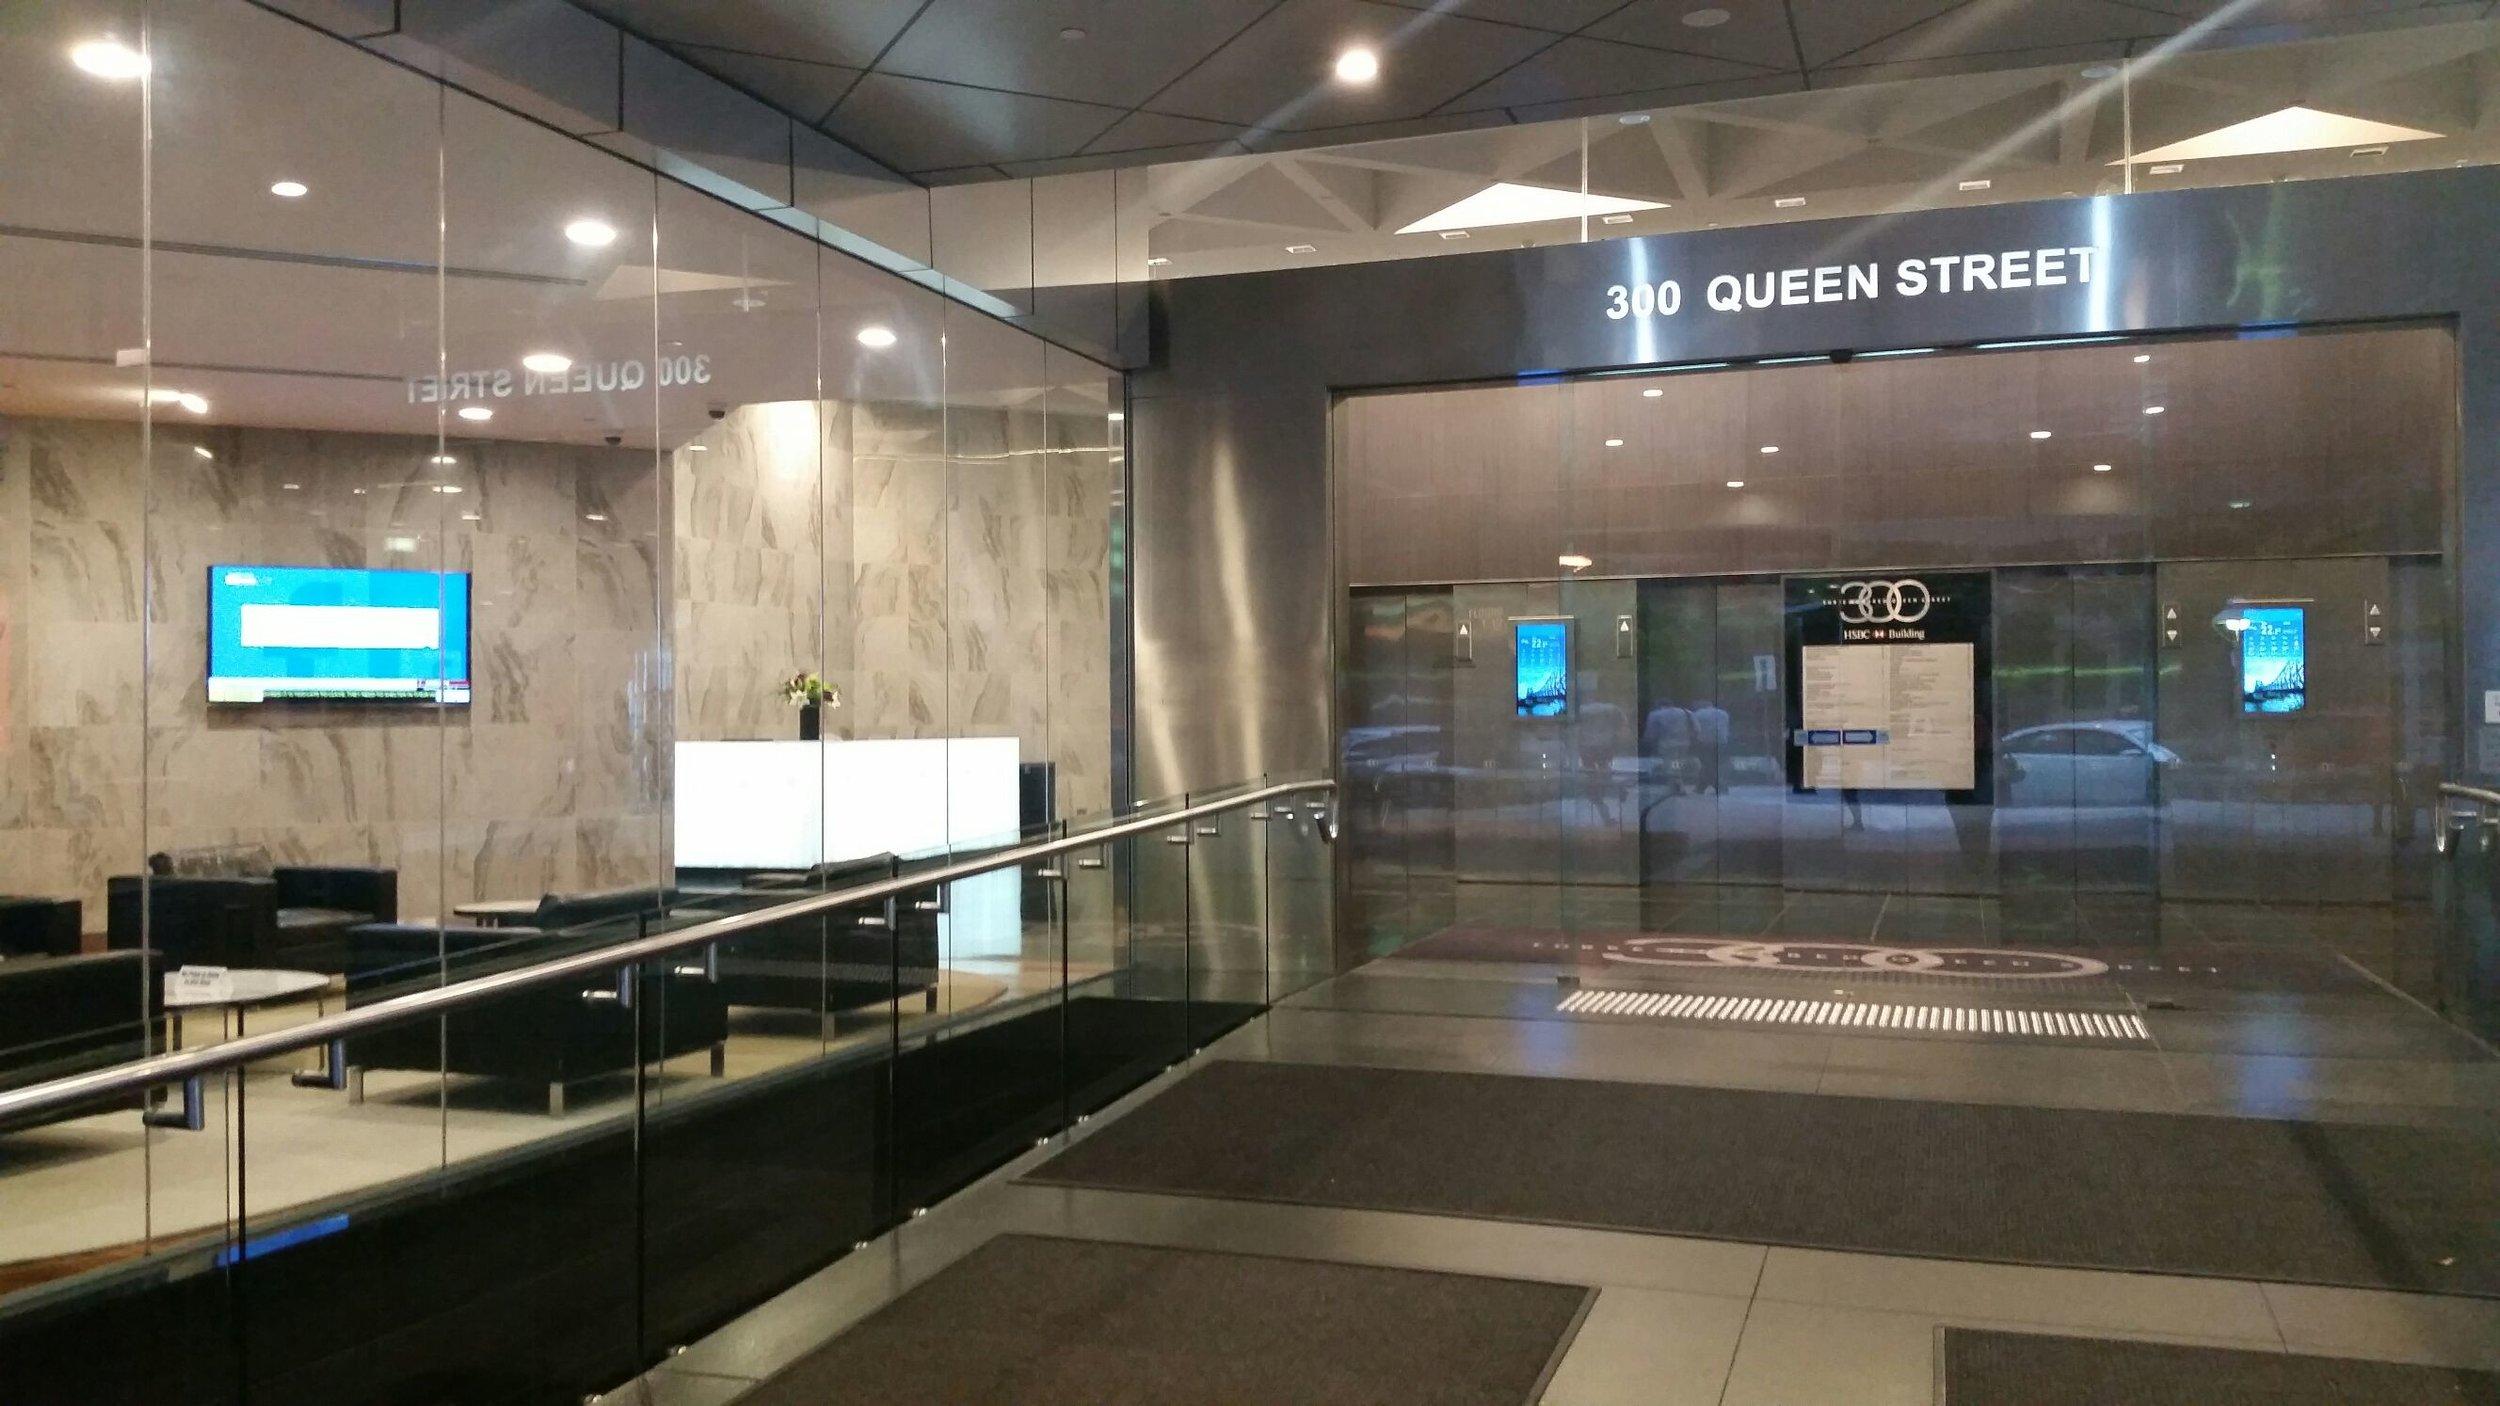 300 Queen St foyer 2.jpg